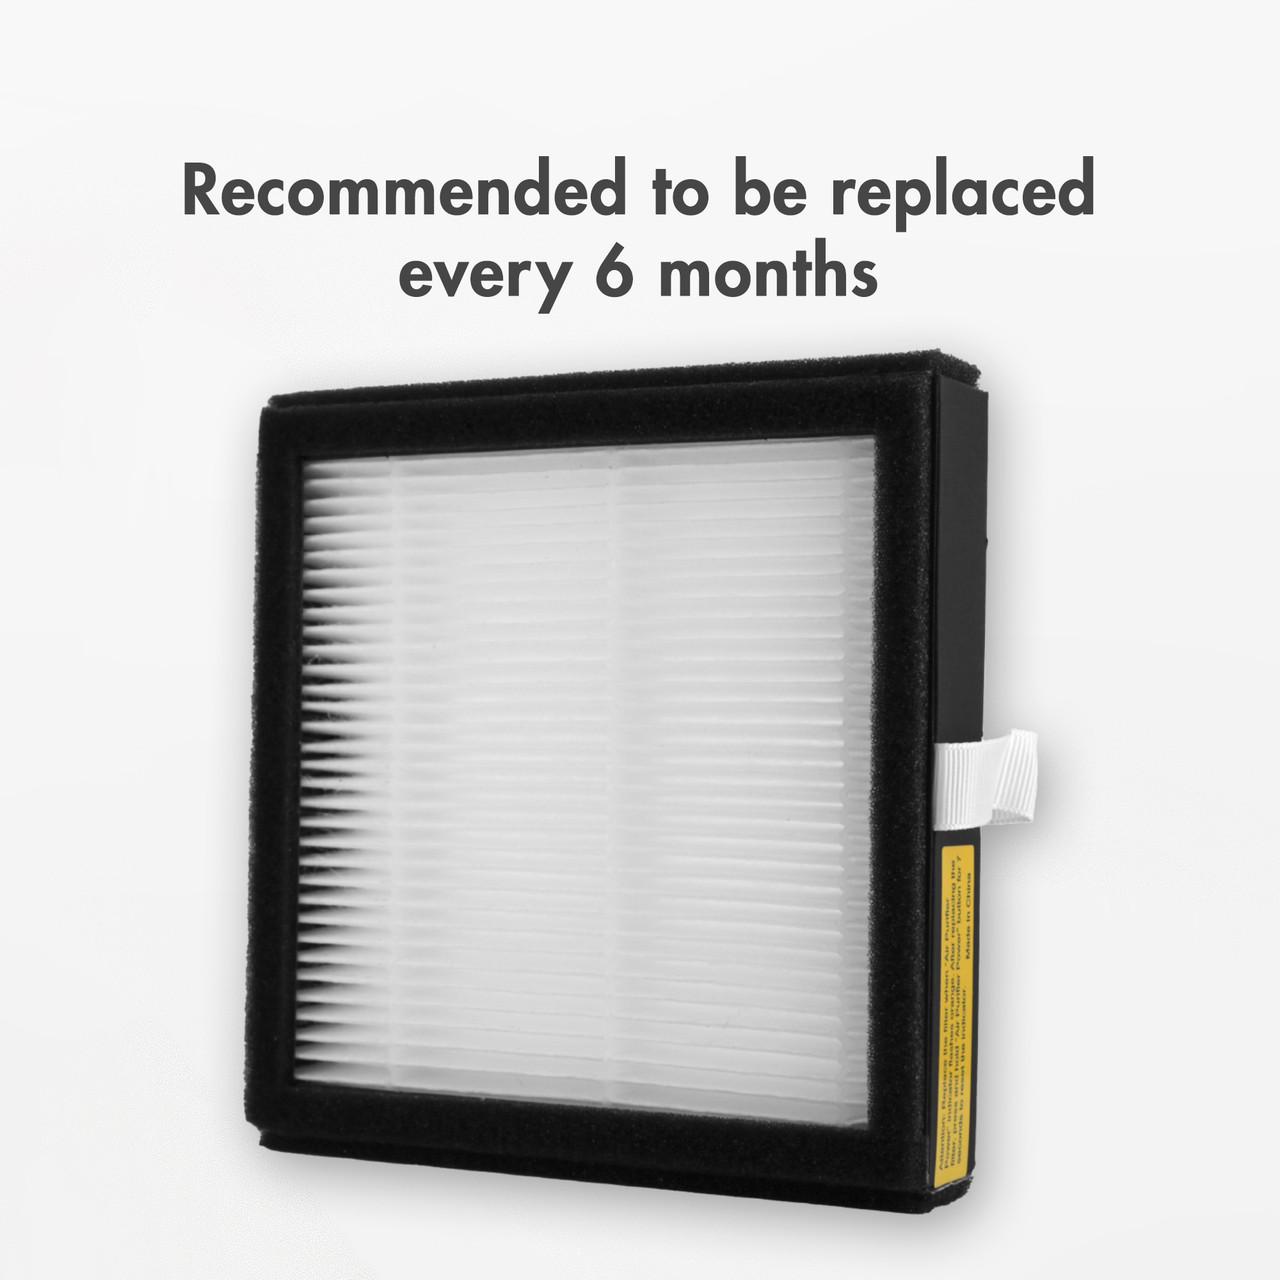 3-Pack Replacement HEPA Filter for Sorbi 1000ml